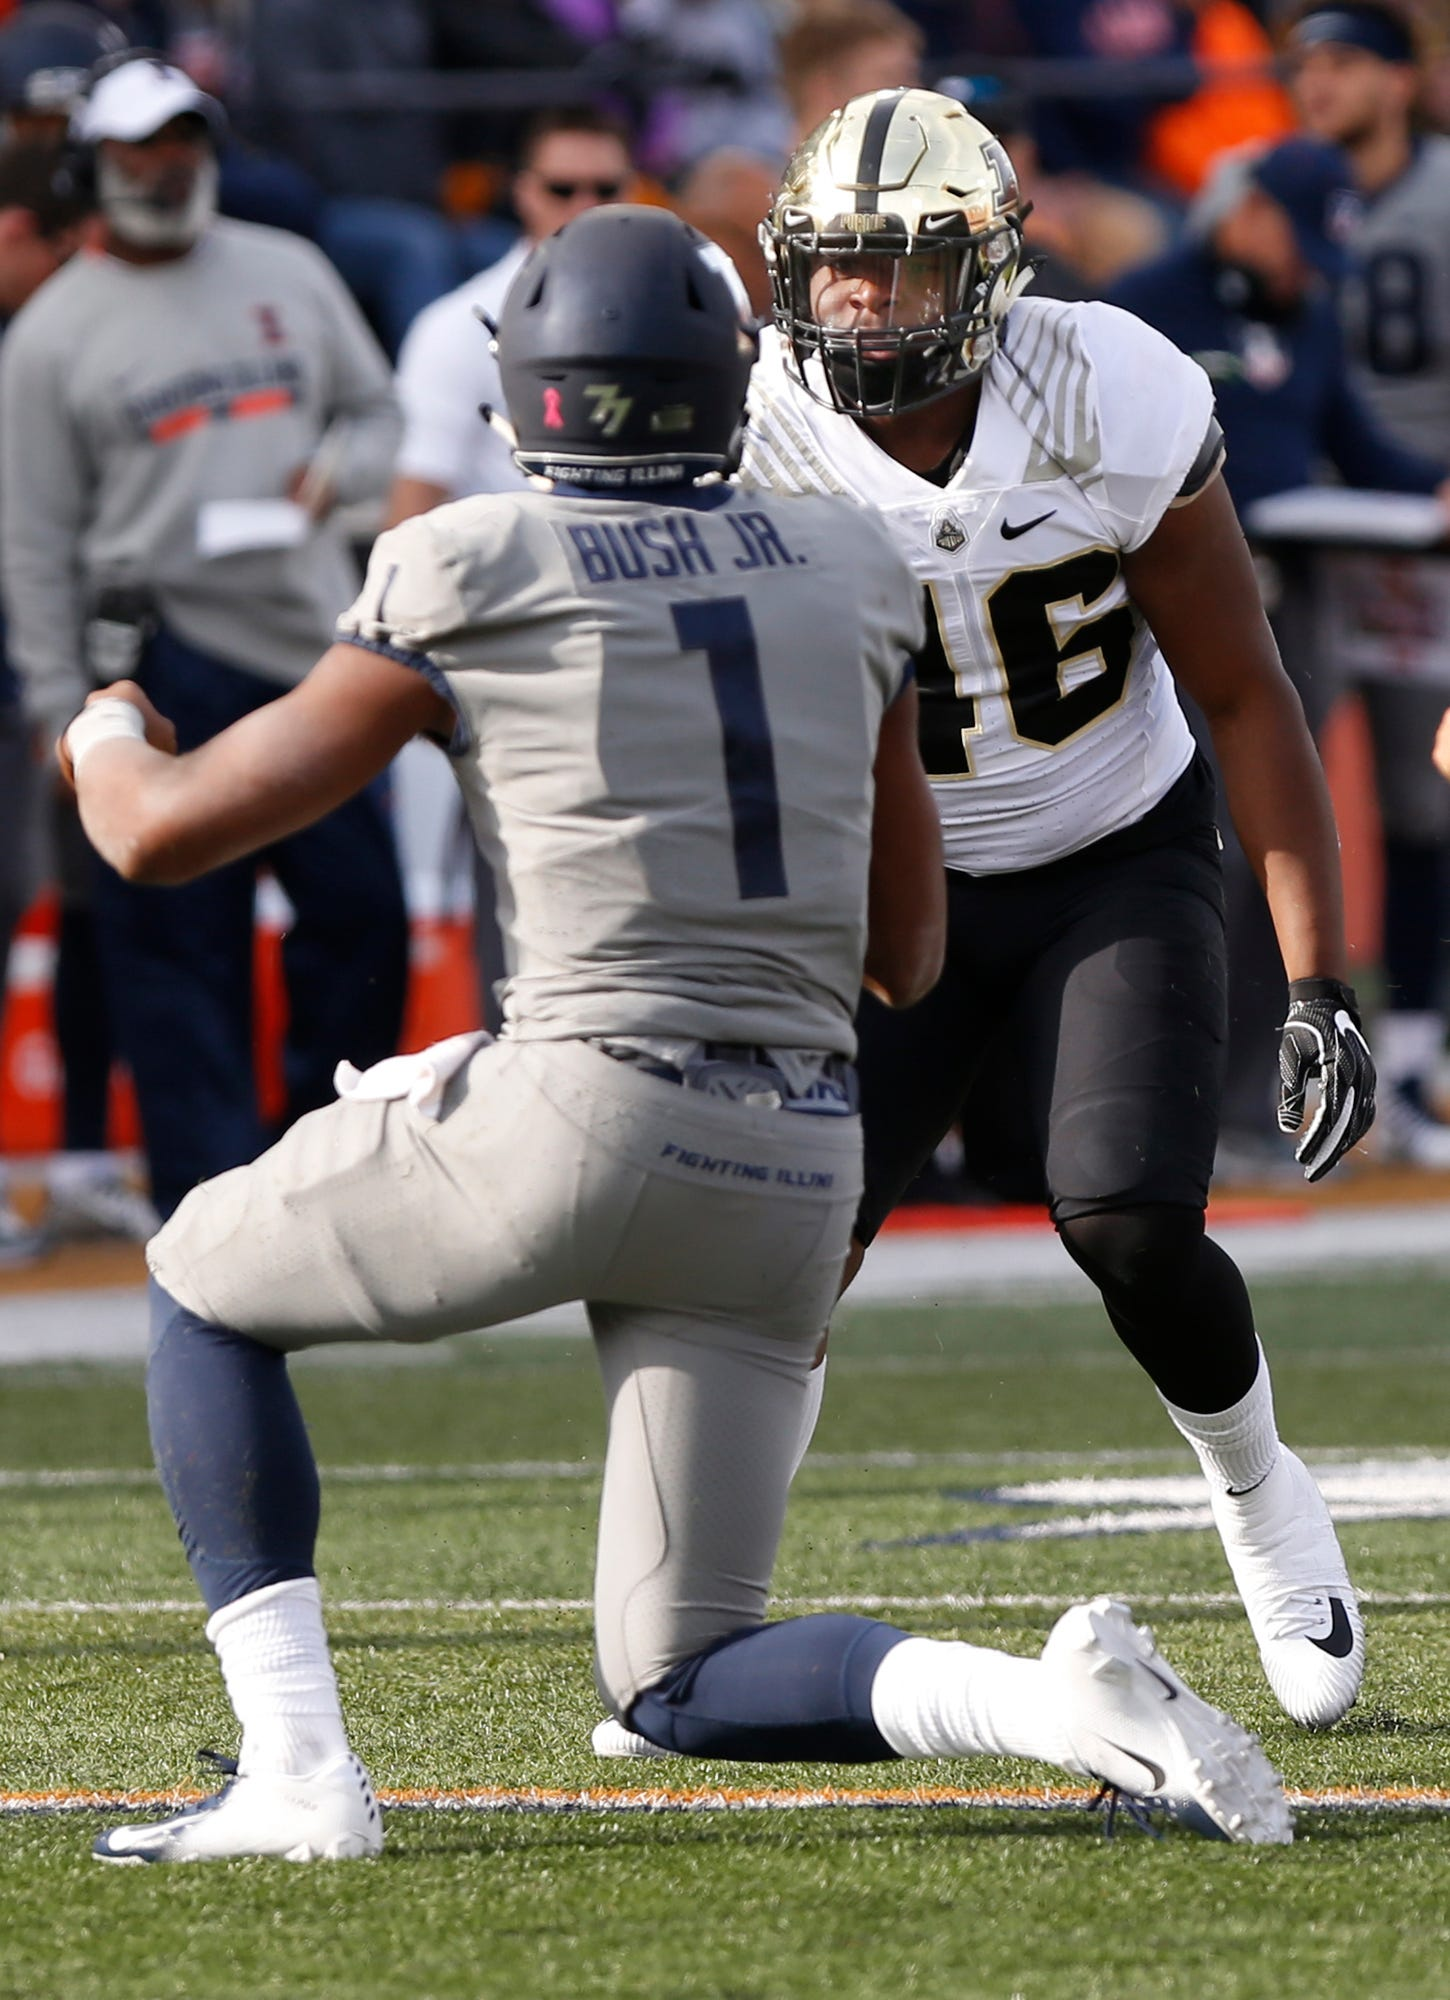 Purdue linebacker Cornel Jones glares at Illinois quarterback AJ Bush Jr. after delivering a hard hit.